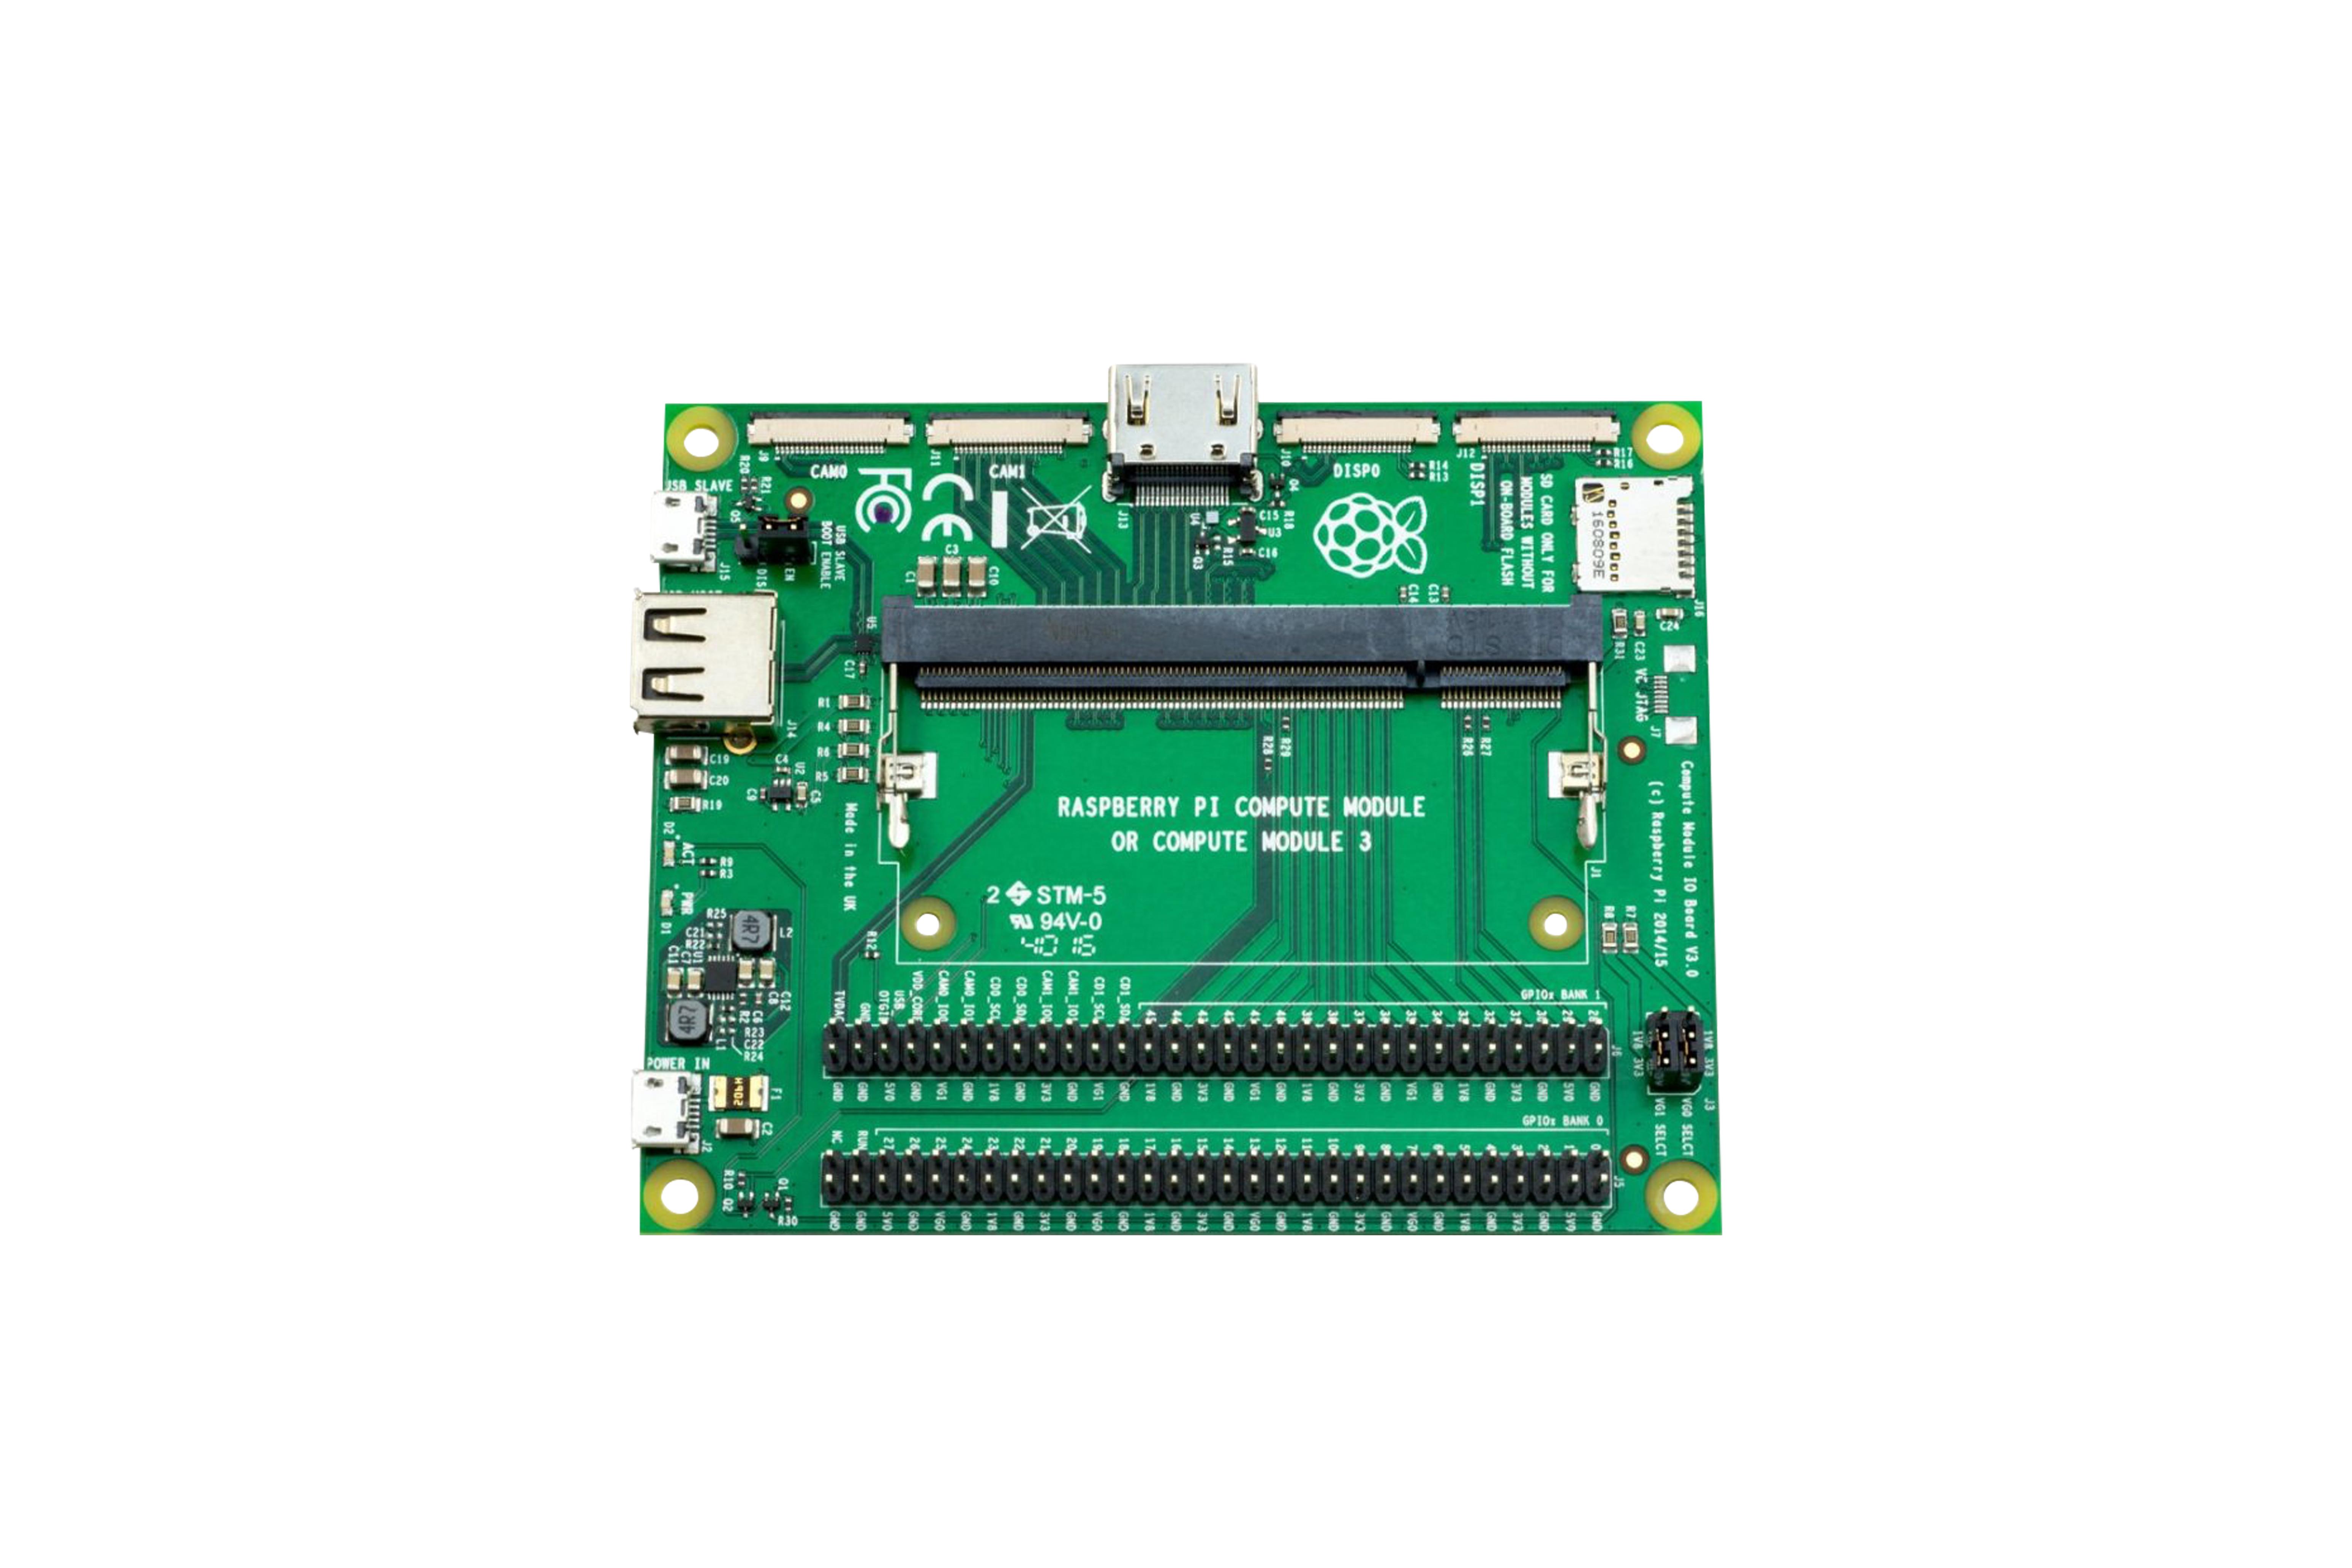 Raspberry Pi(ラズベリーパイ)Compute Module 3開発キット